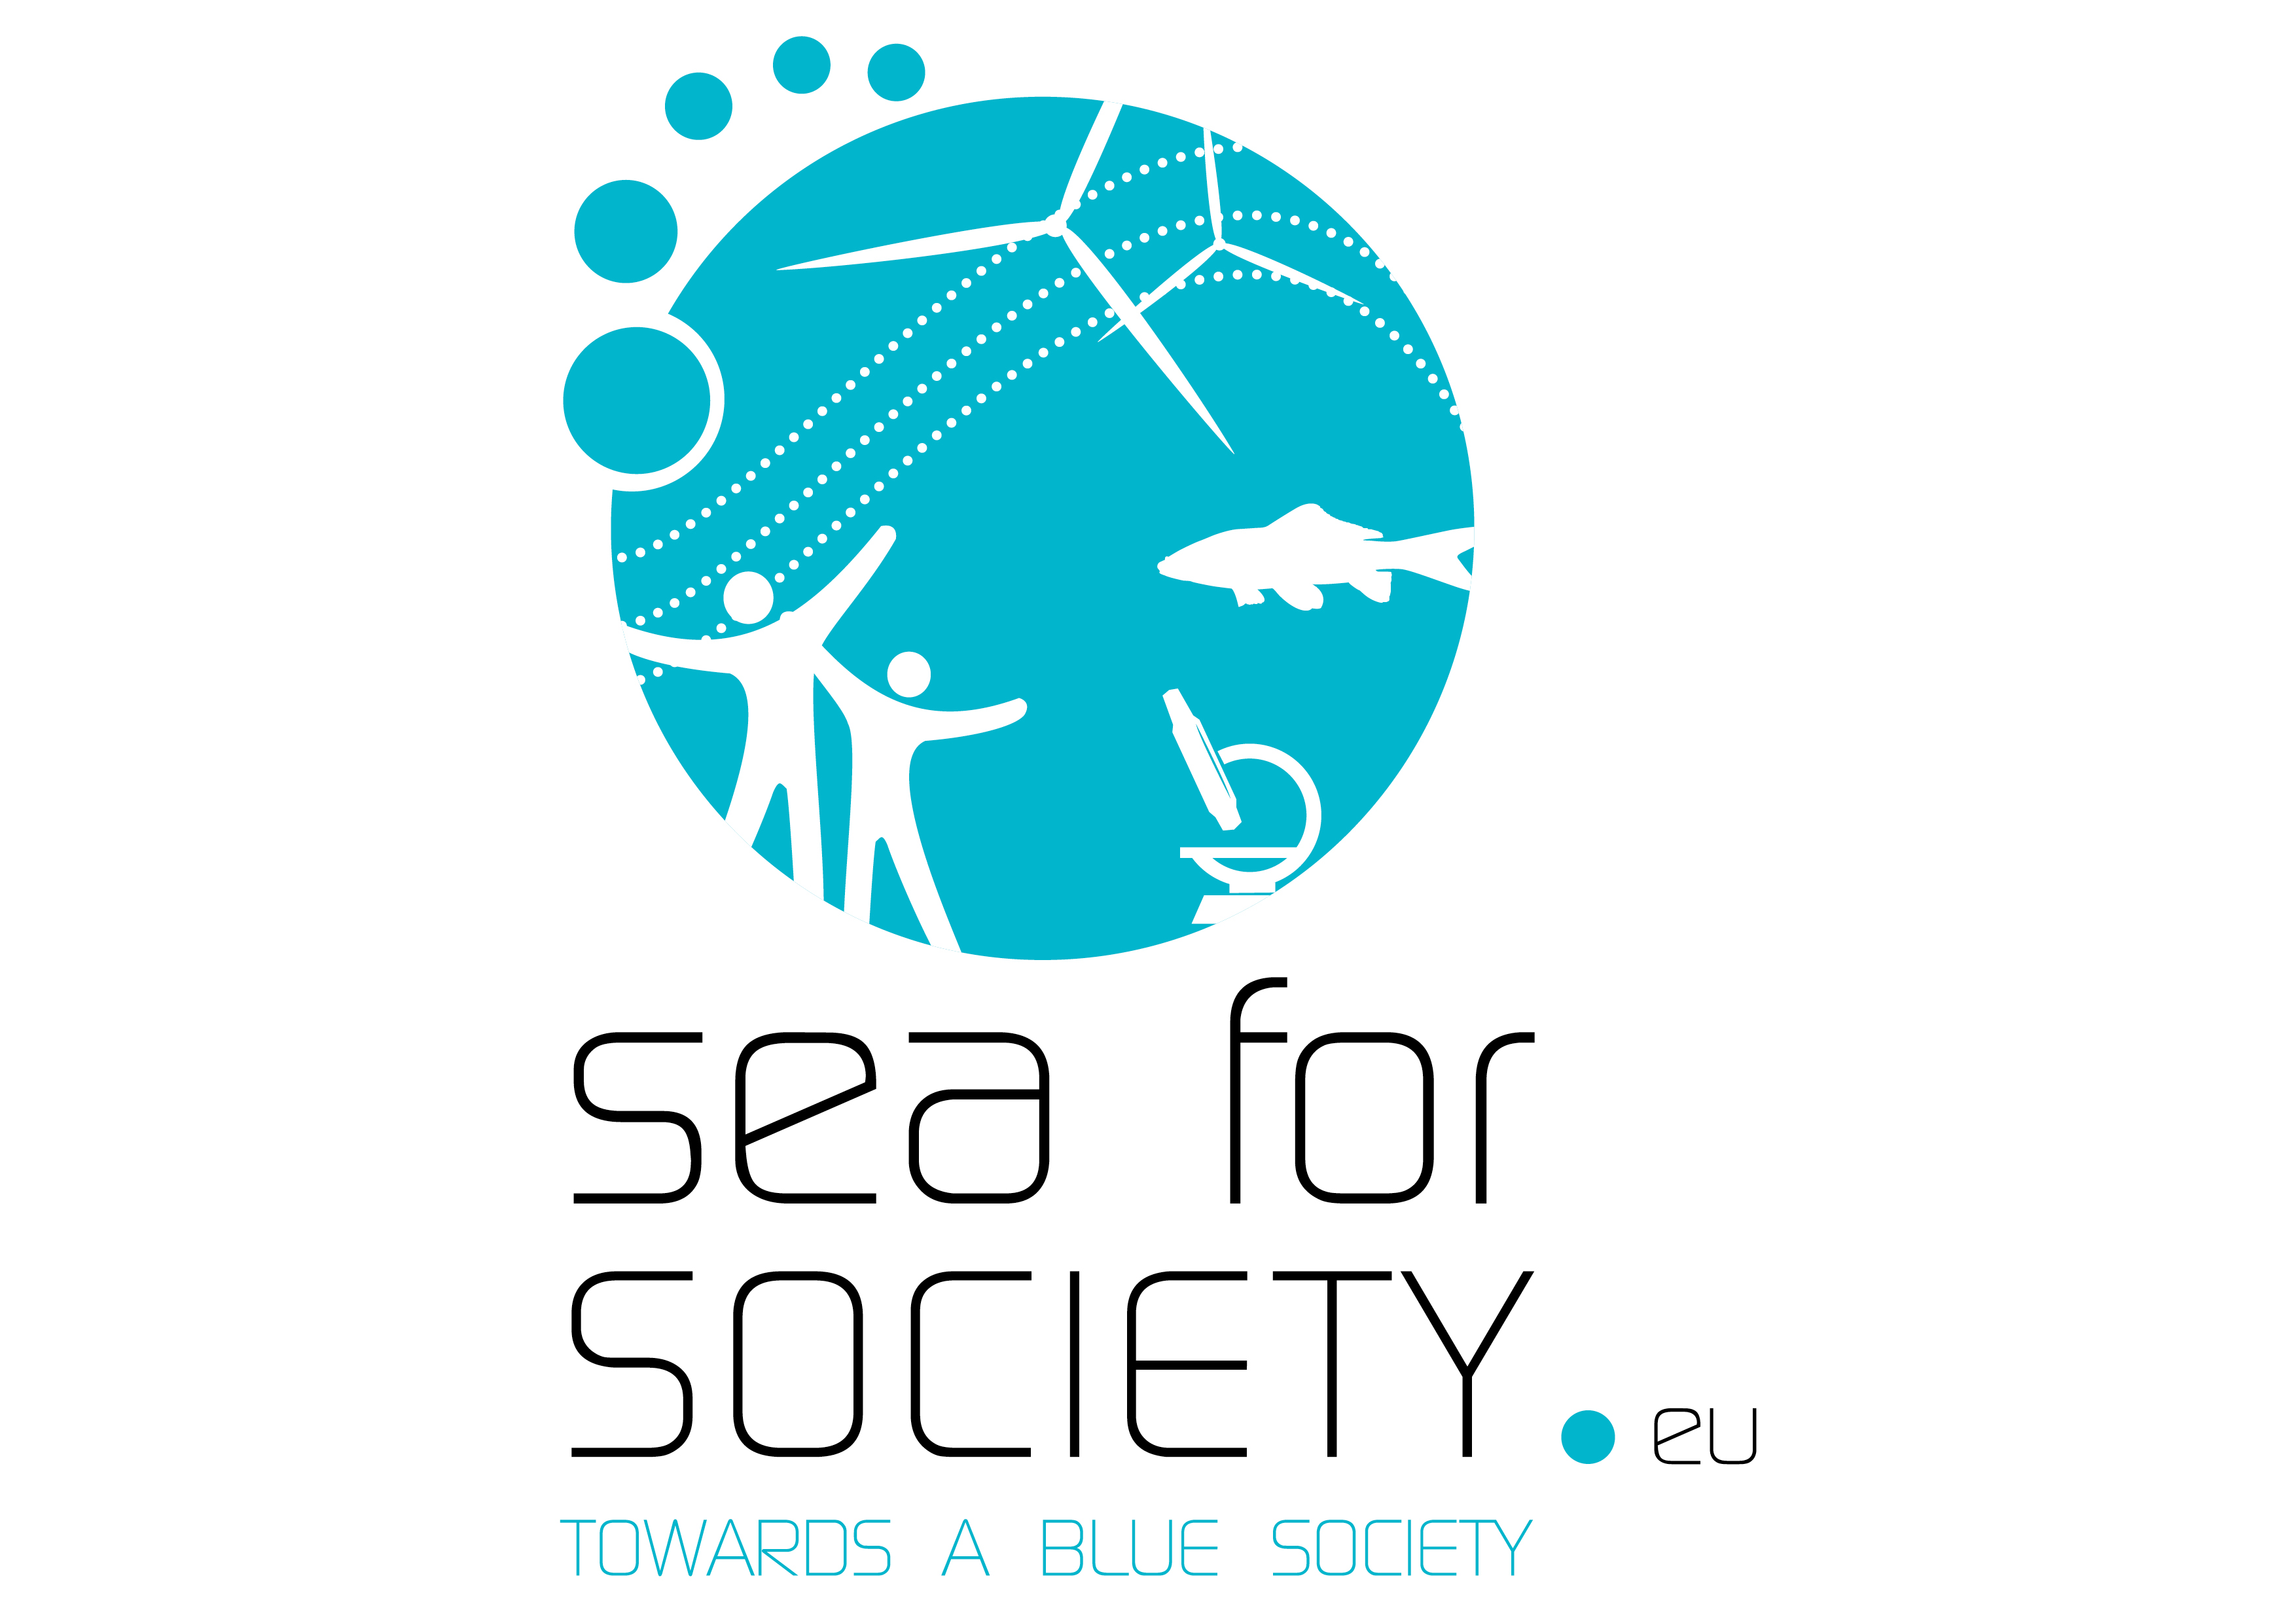 SEAFORSOCIETY logo